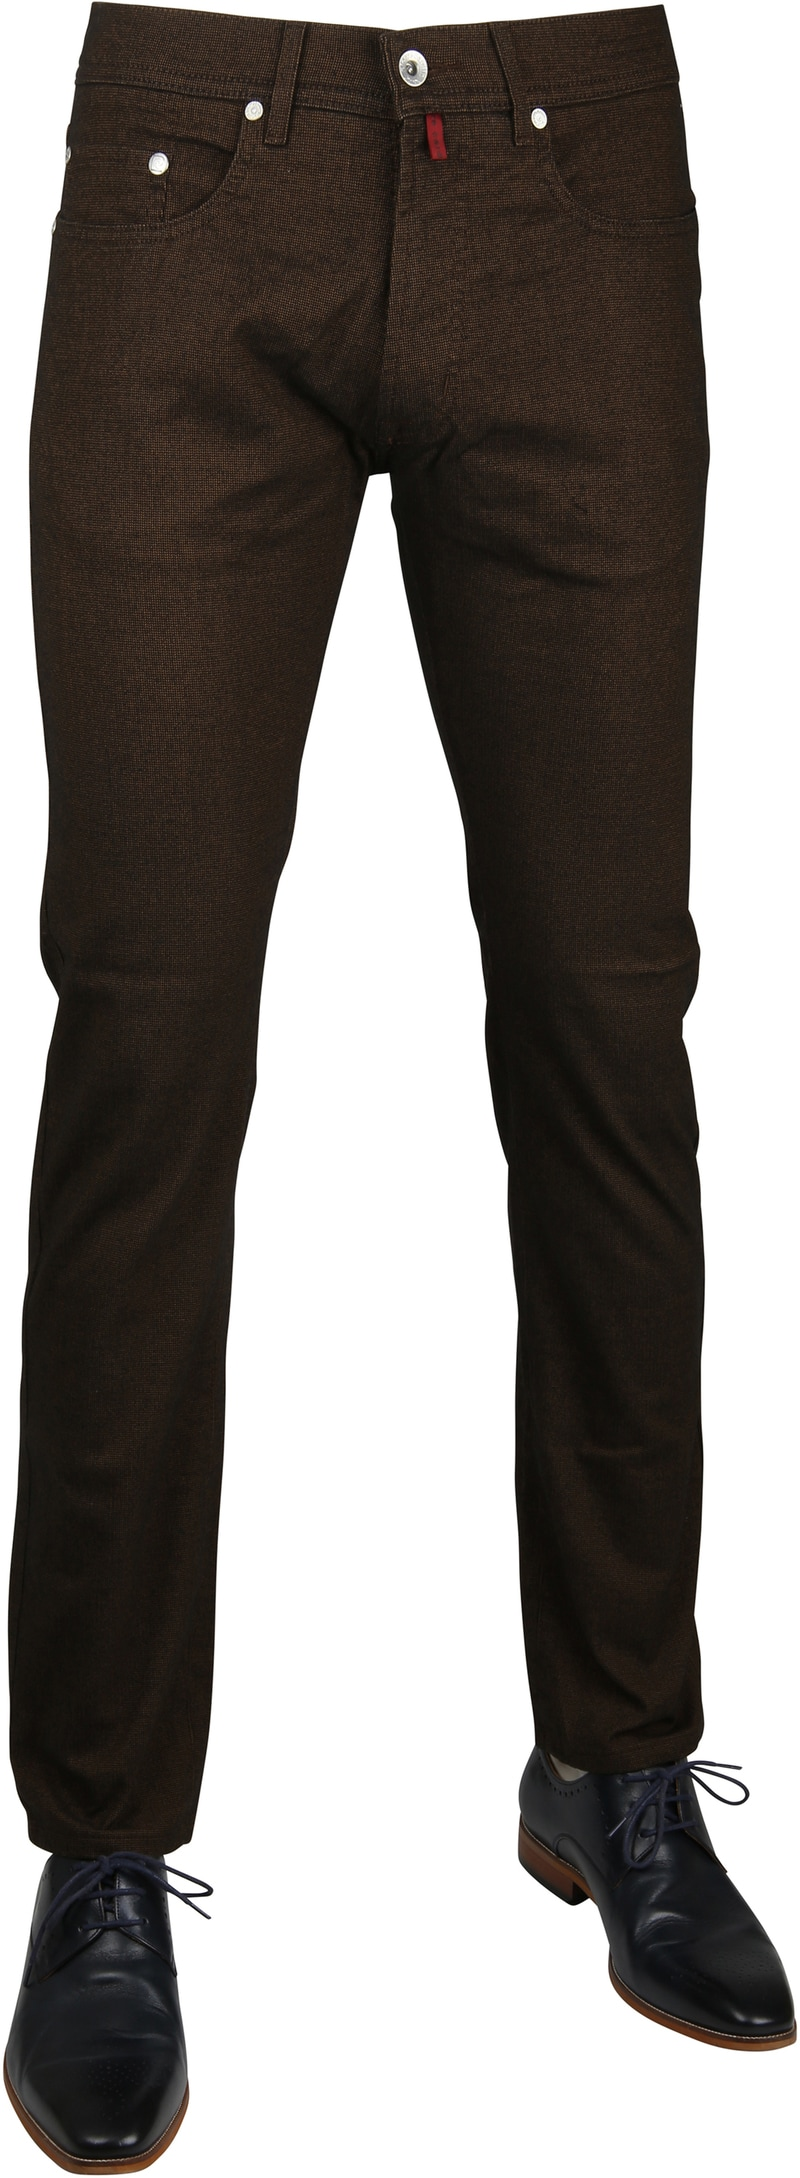 Pierre Cardin Lyon Trousers Caramel photo 0